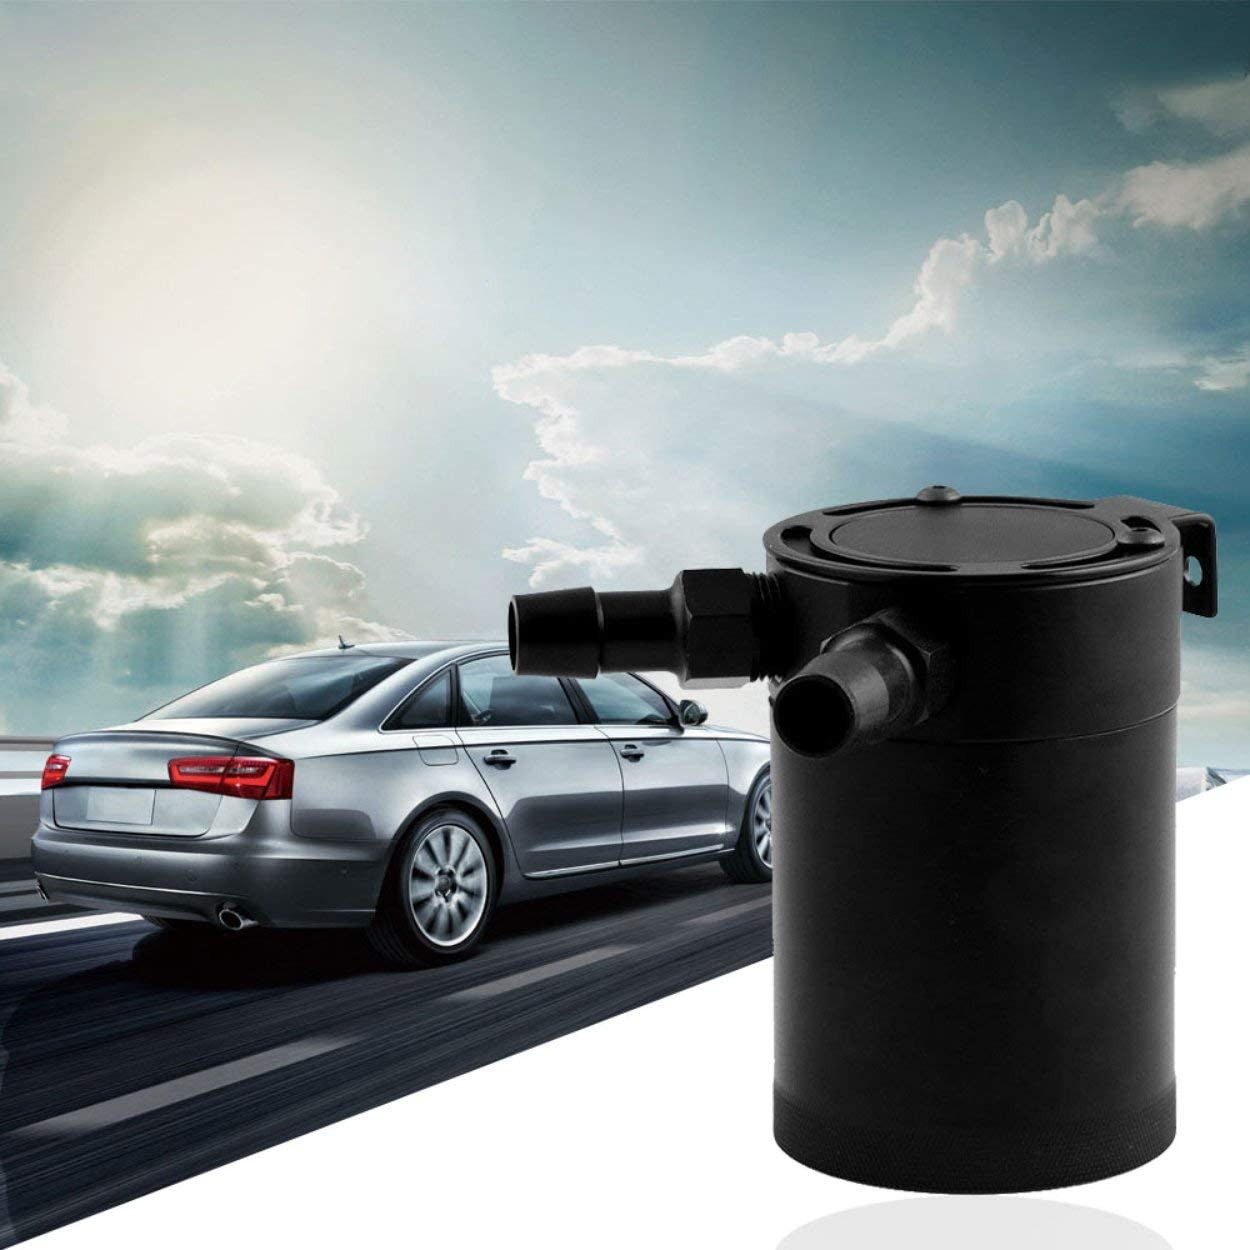 Universal Mishimoto Compact Baffled Oil Catch Can 2-Port Universal Zwei-Loch-Abgasr/ückgewinnungskessel